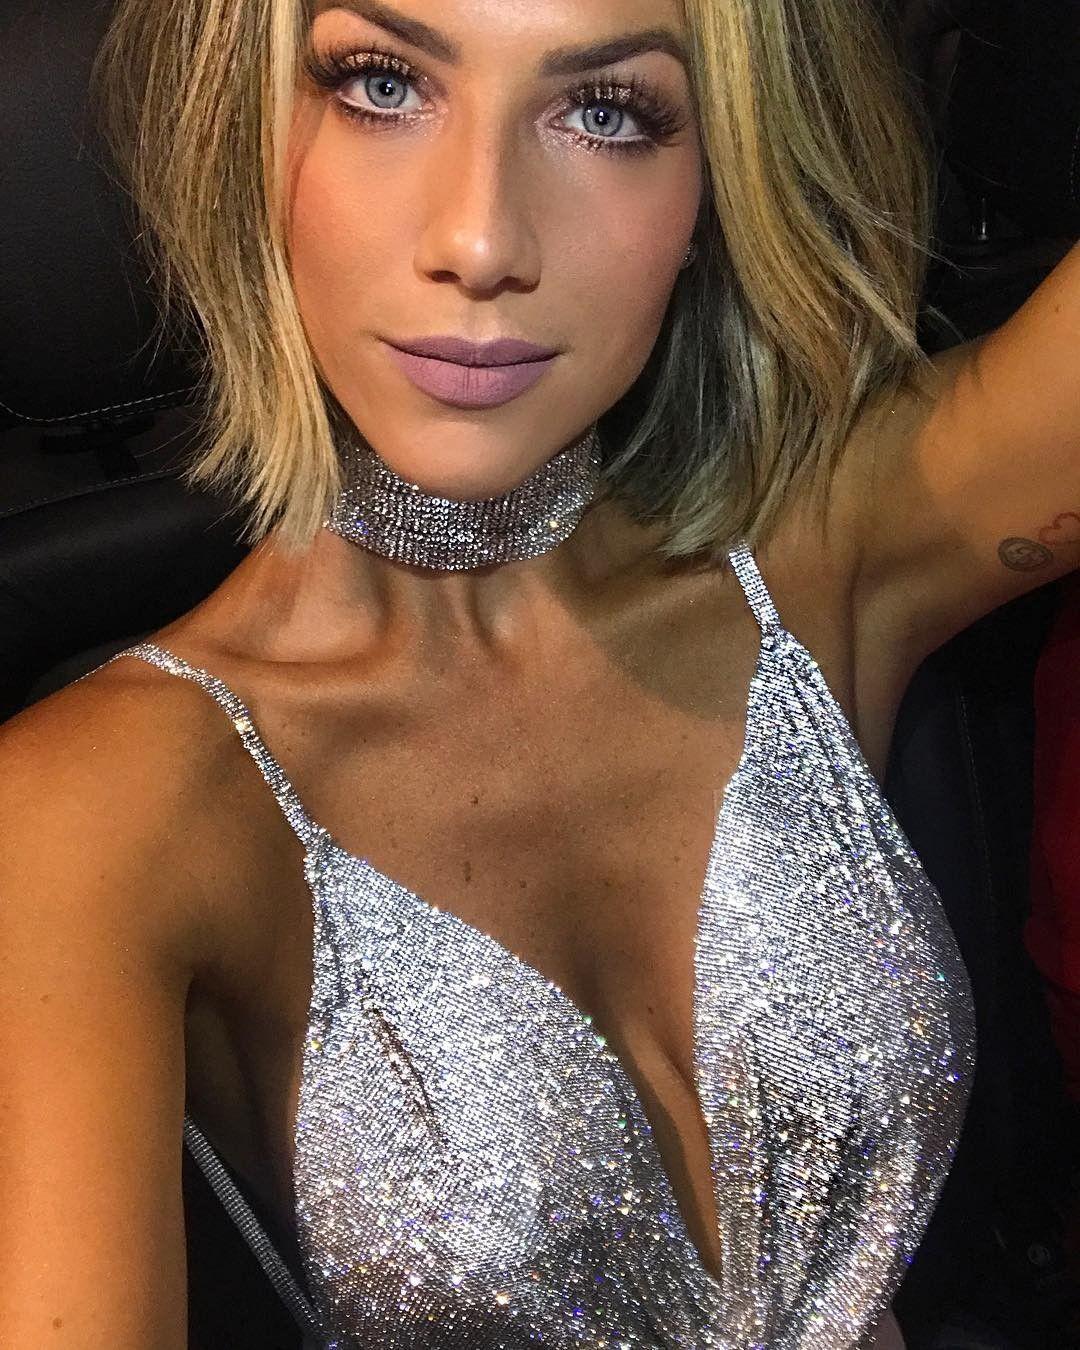 Boobs Giovanna Ewbank naked (68 photos), Pussy, Leaked, Instagram, butt 2017